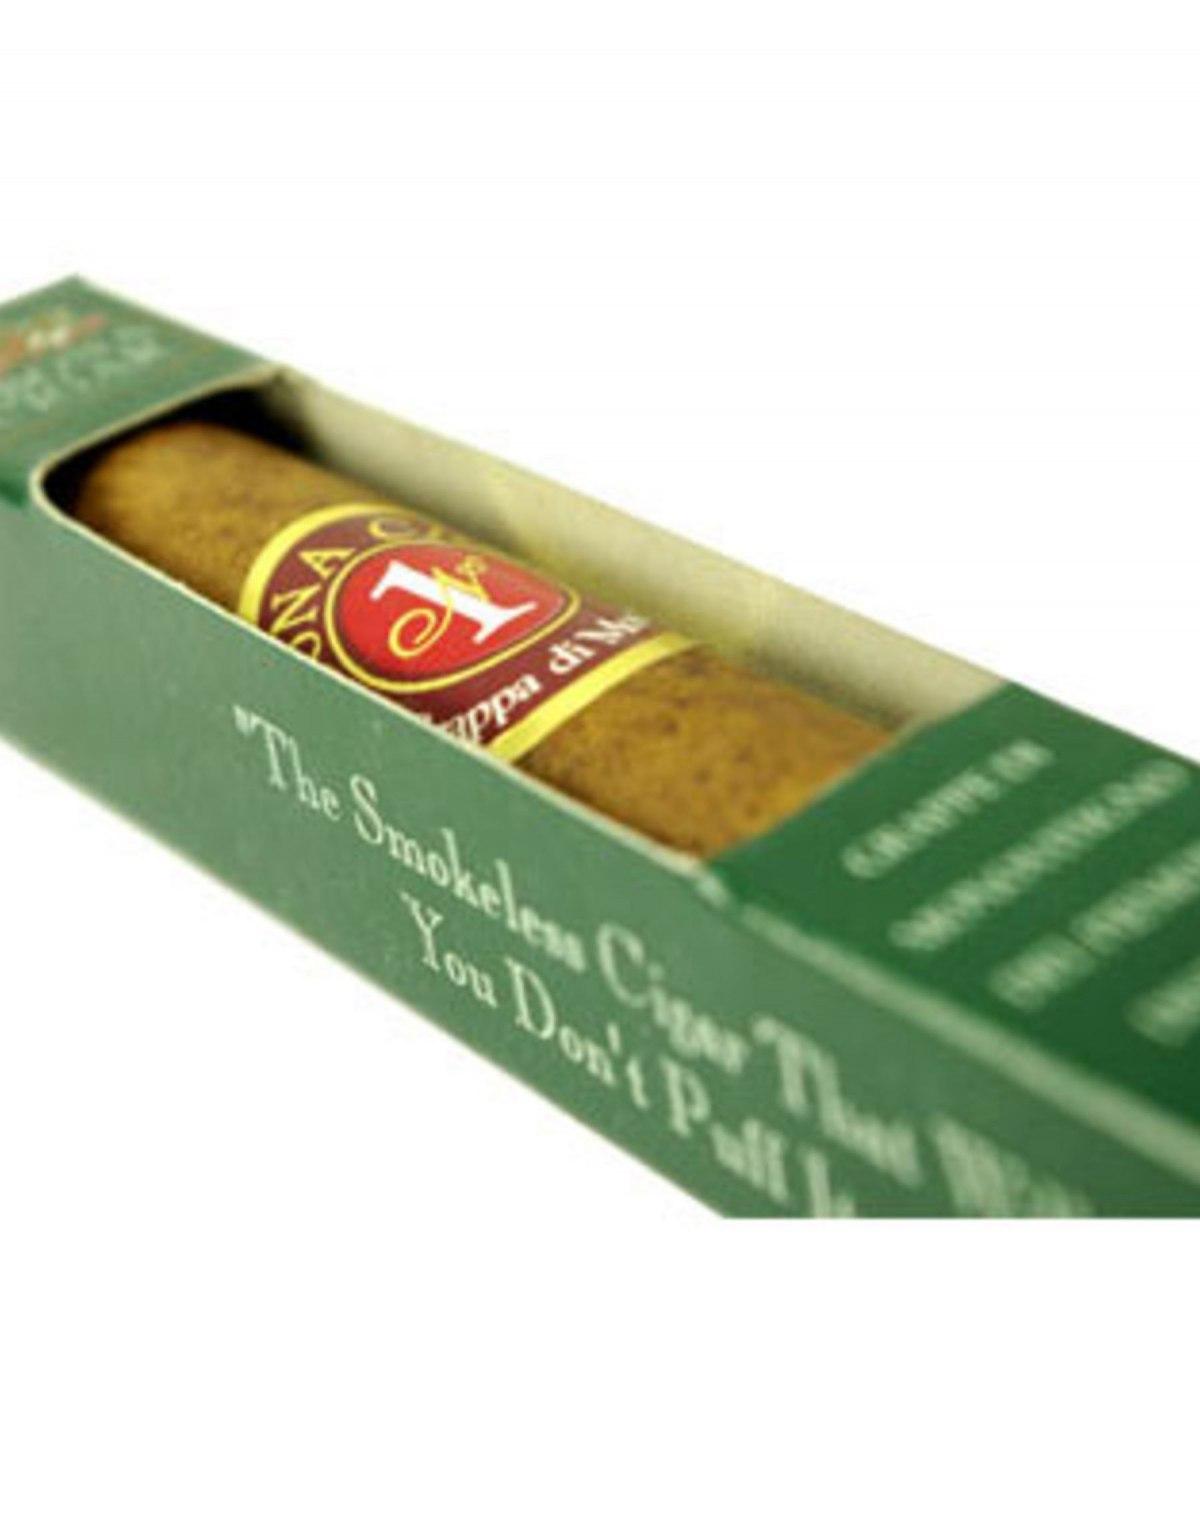 Cigar Sibona - Drinking Cigars